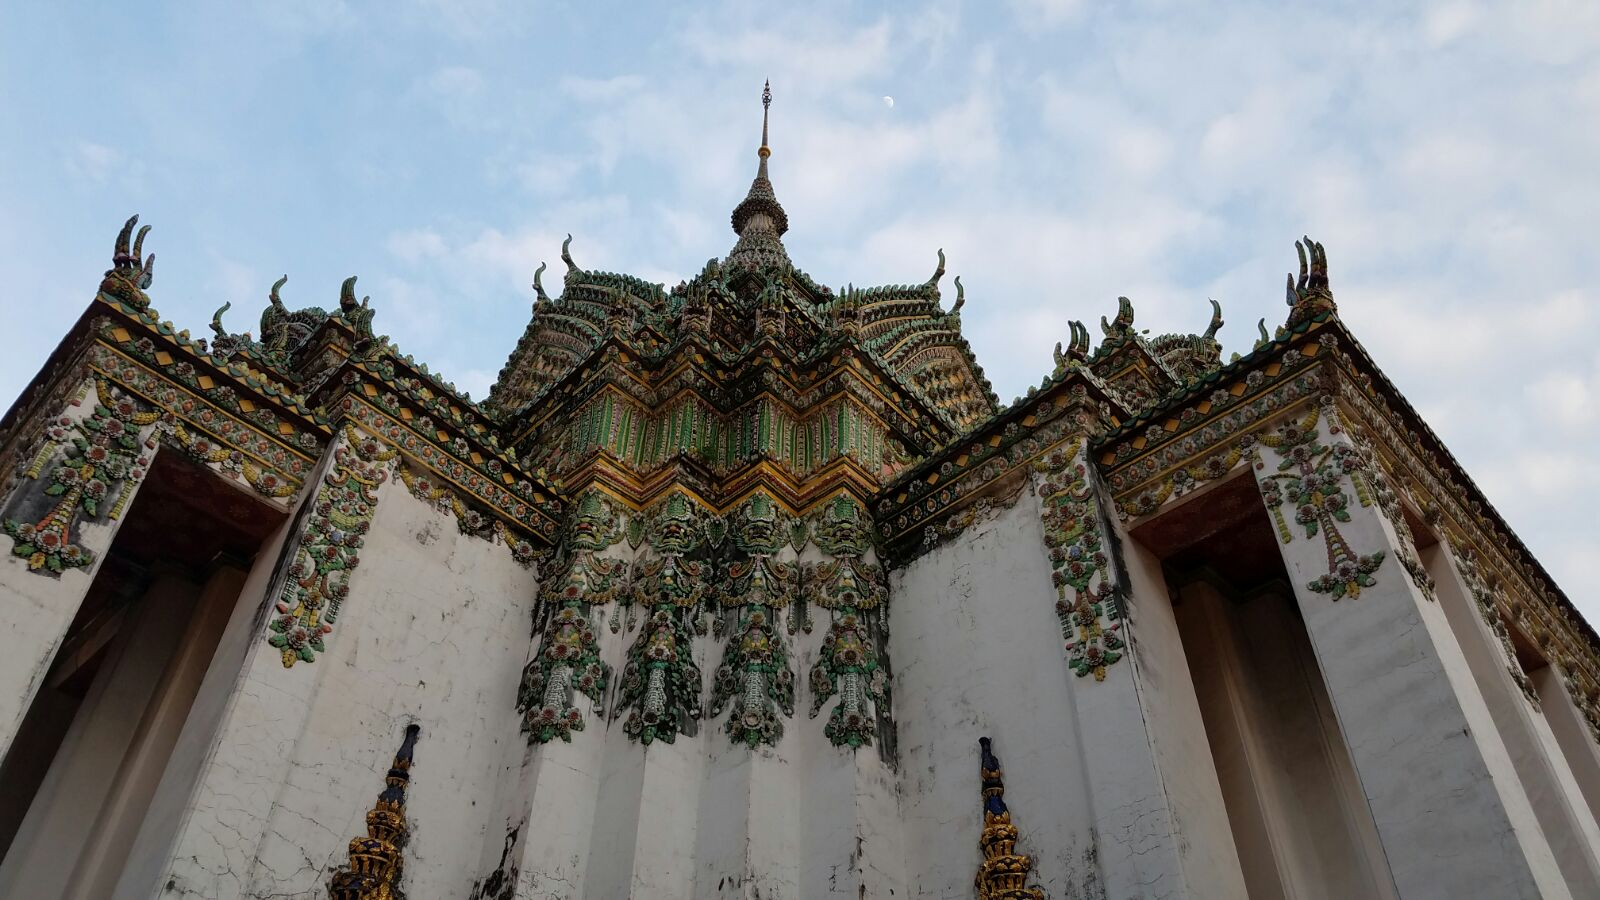 Favorite temple at Wat Pho